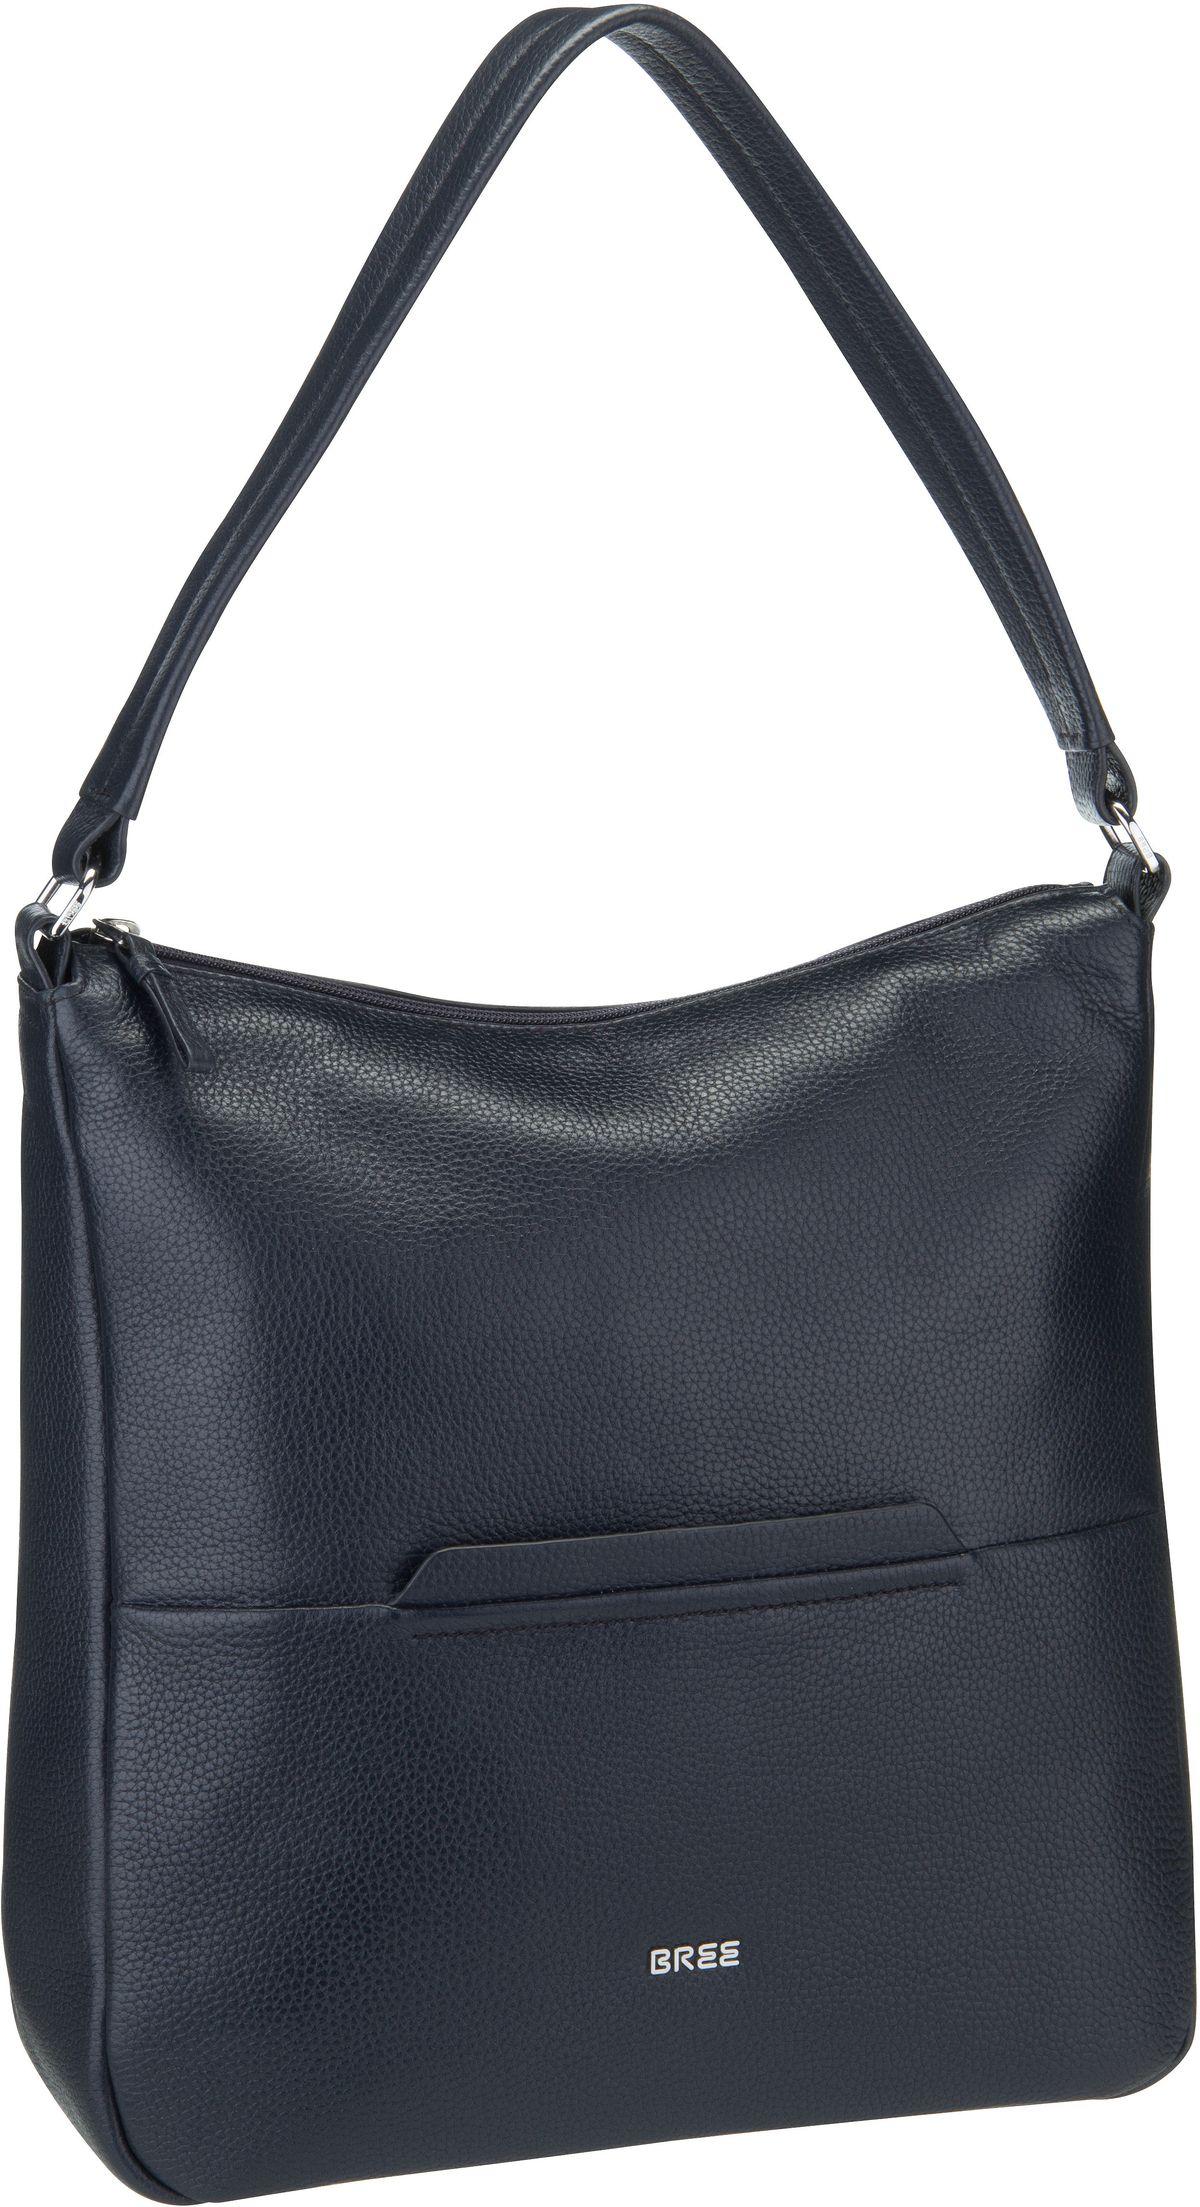 Handtasche Nola 12 Blue